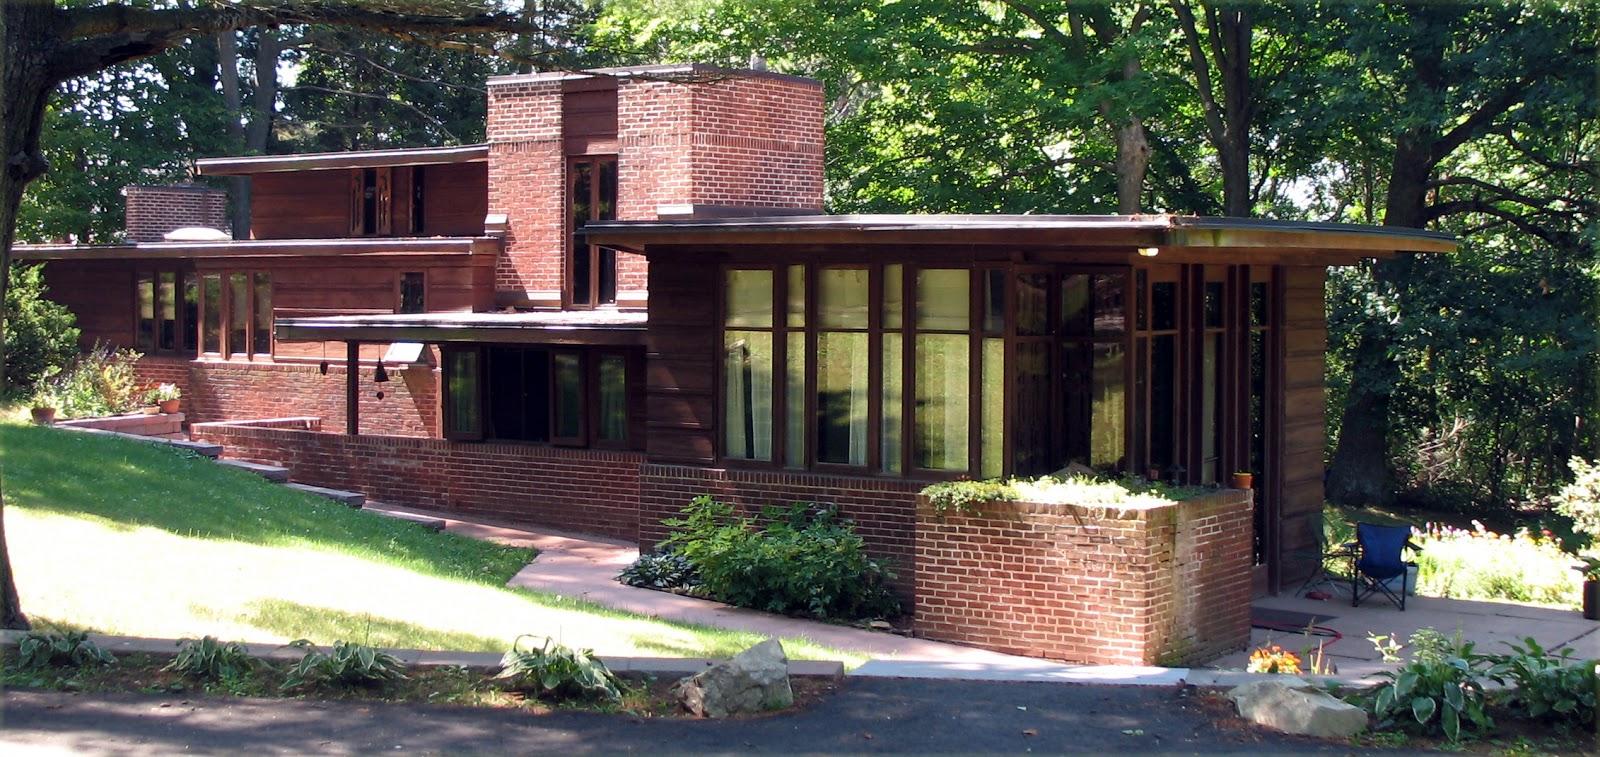 Kitten vintage mcm audette house and castlecrag - Frank lloyd wright architecture style ...